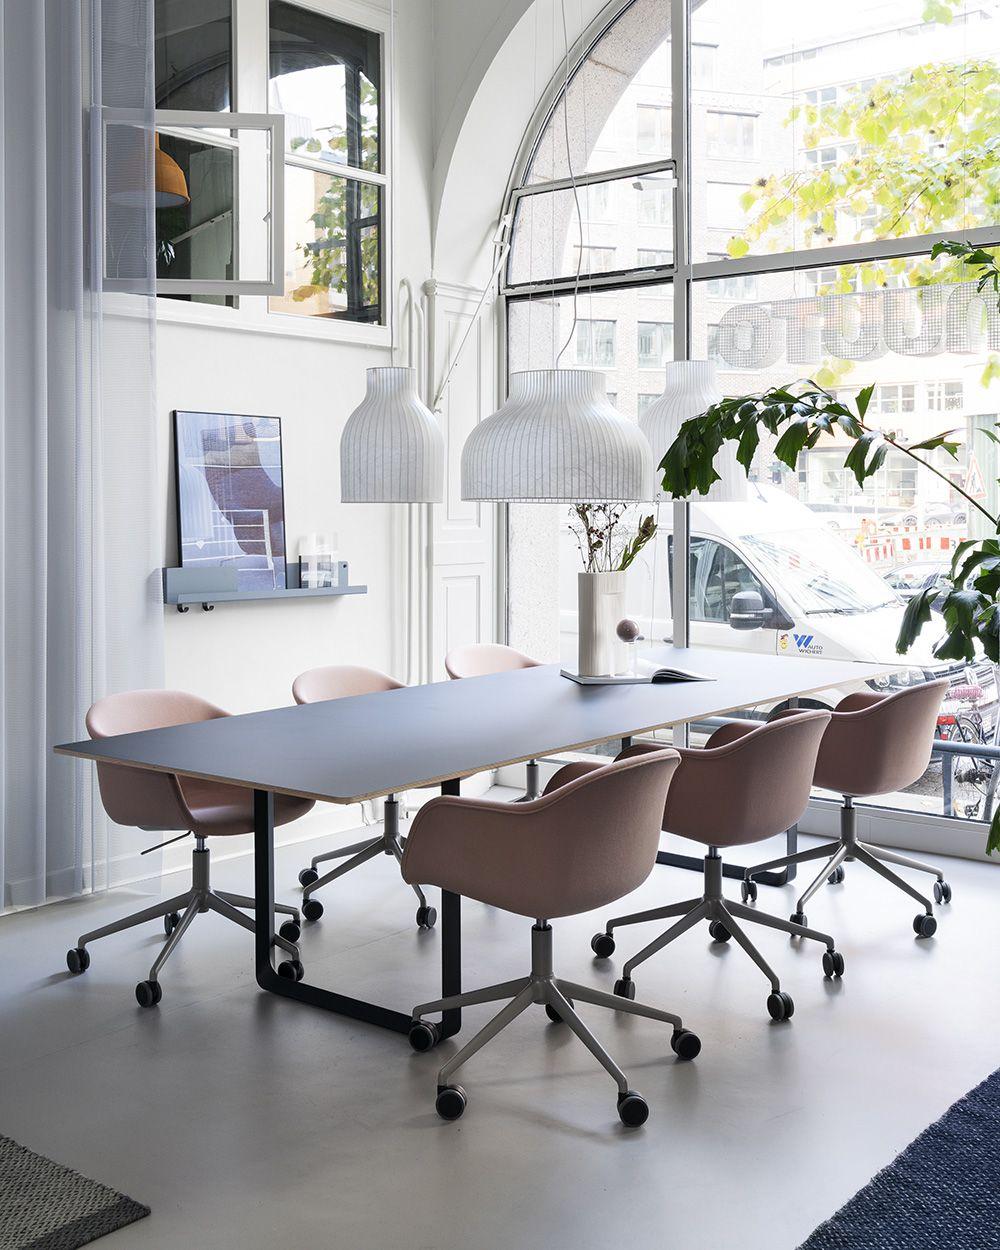 Scandinavian Office Space Decor Inspiration From Muuto The Fiber Armchair Brings A Ne In 2020 Office Design Inspiration Office Interior Design Office Furniture Design